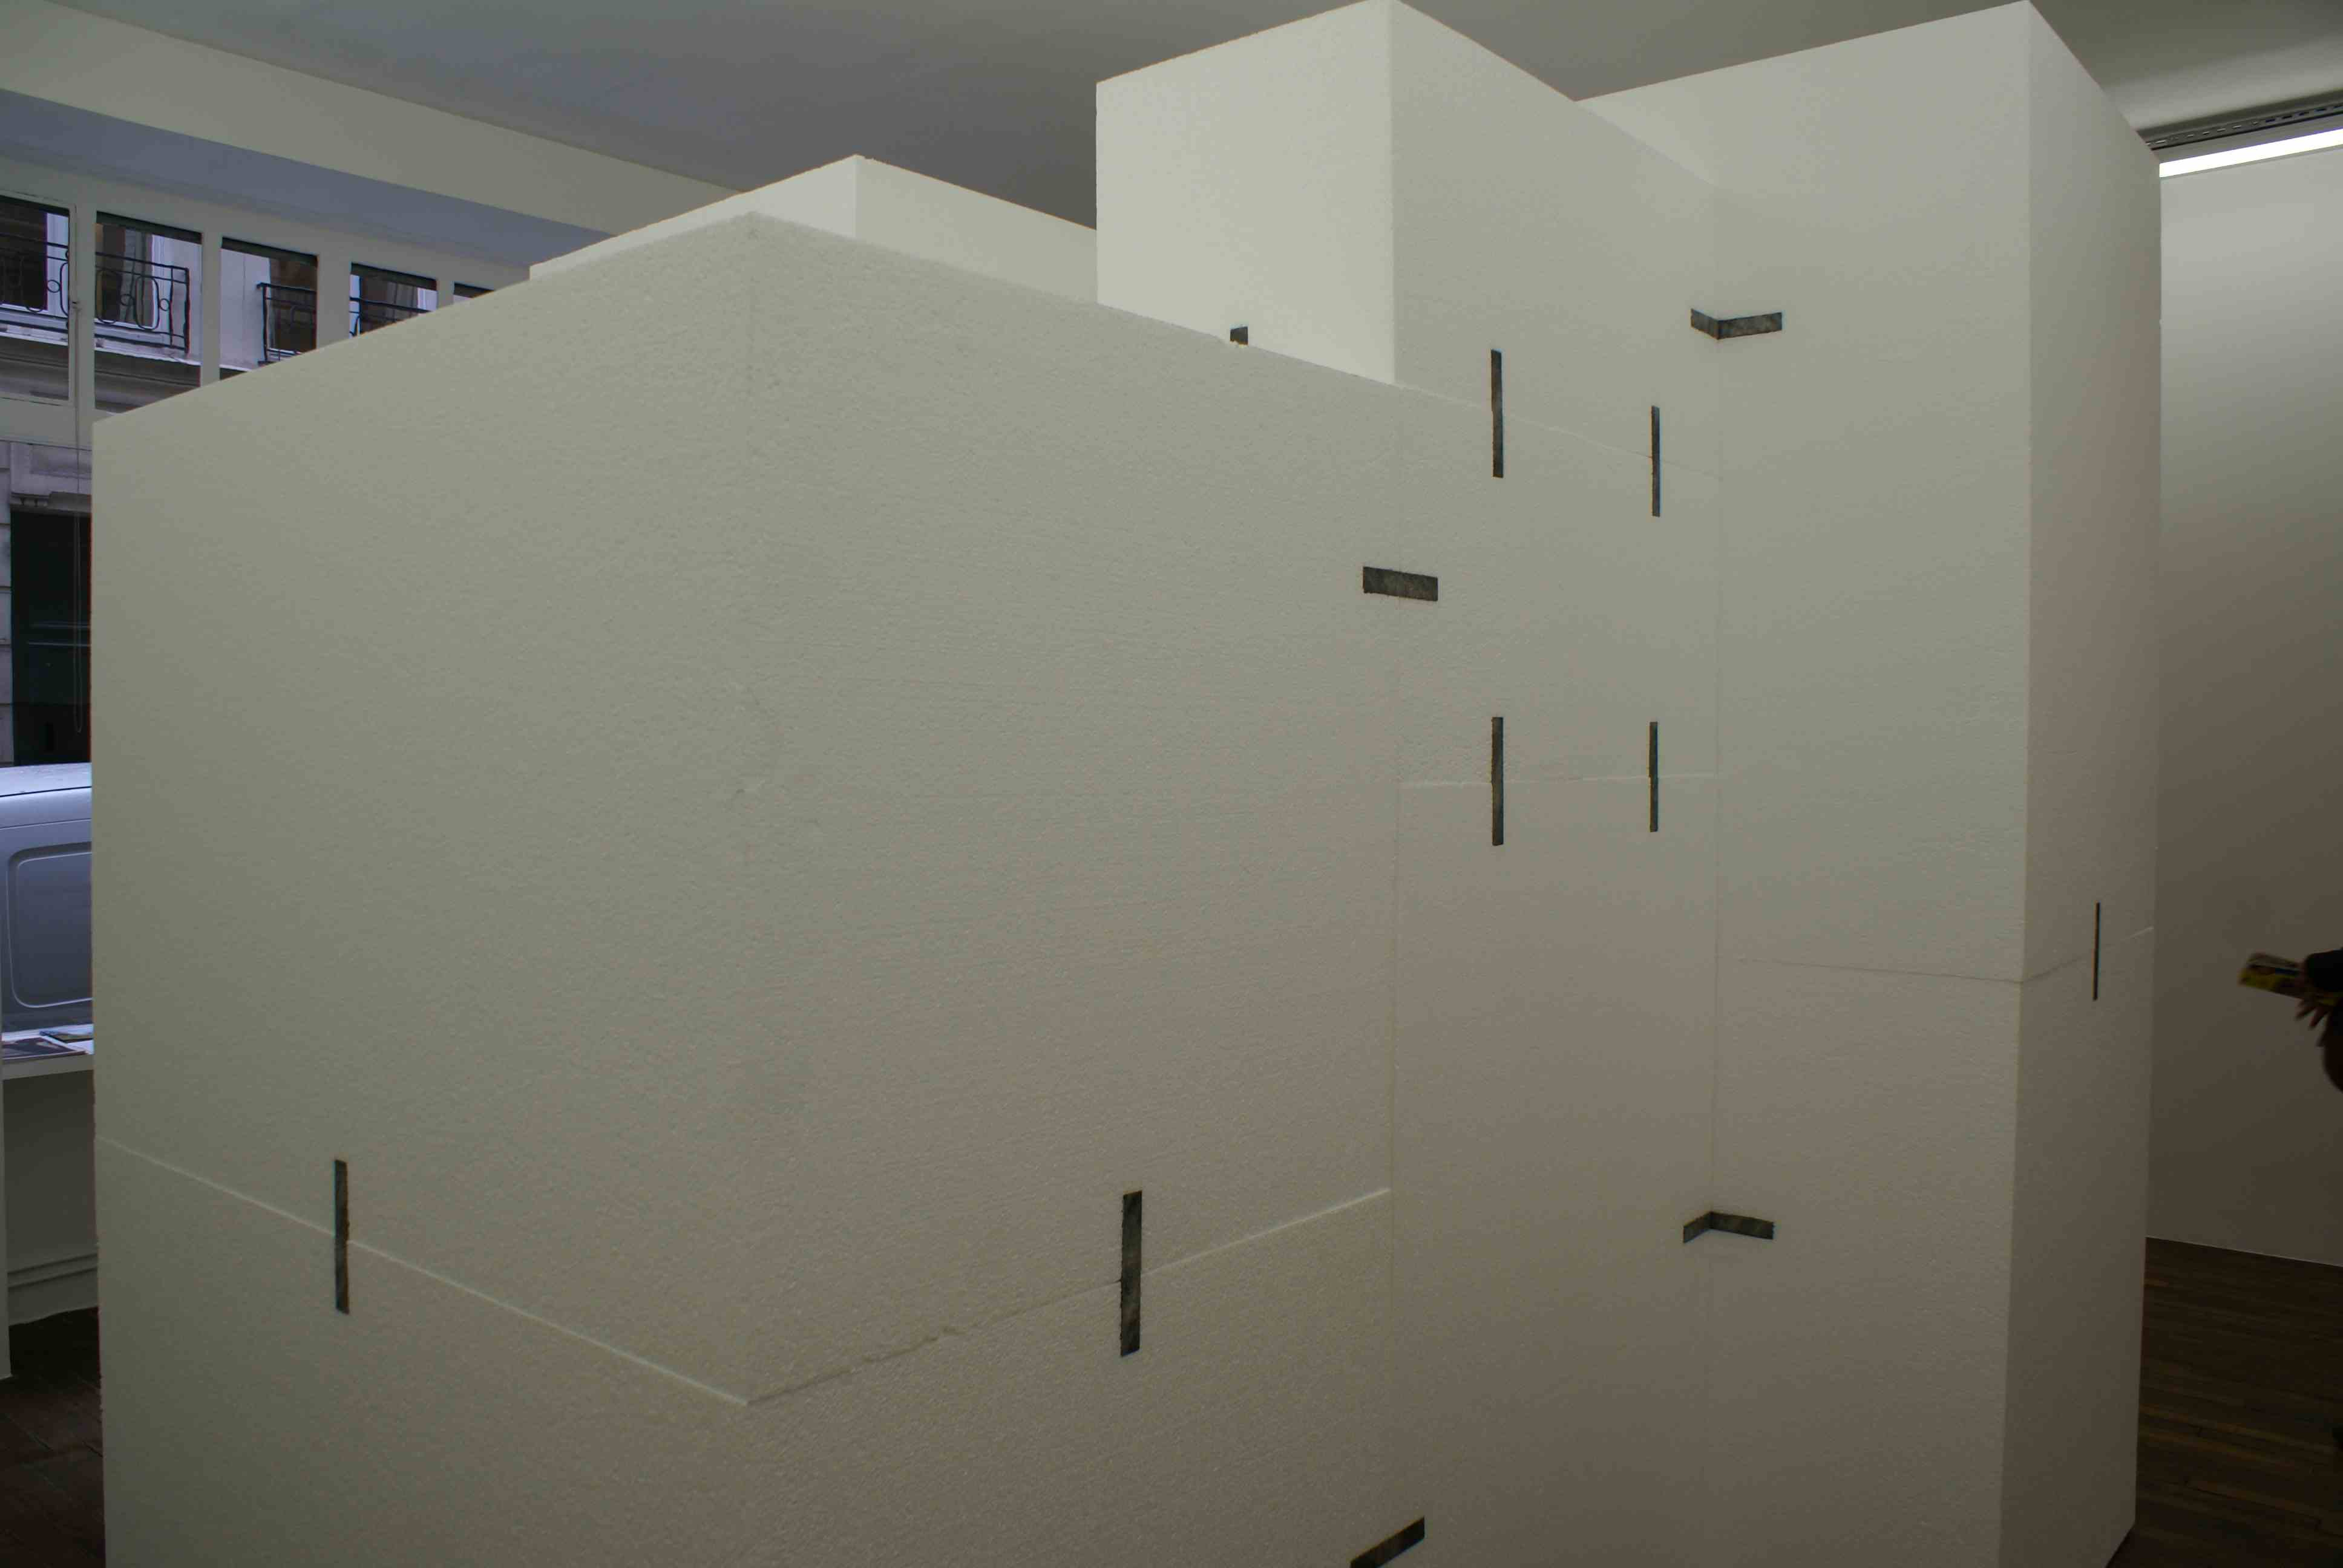 installation sonore comment c 39 est. Black Bedroom Furniture Sets. Home Design Ideas